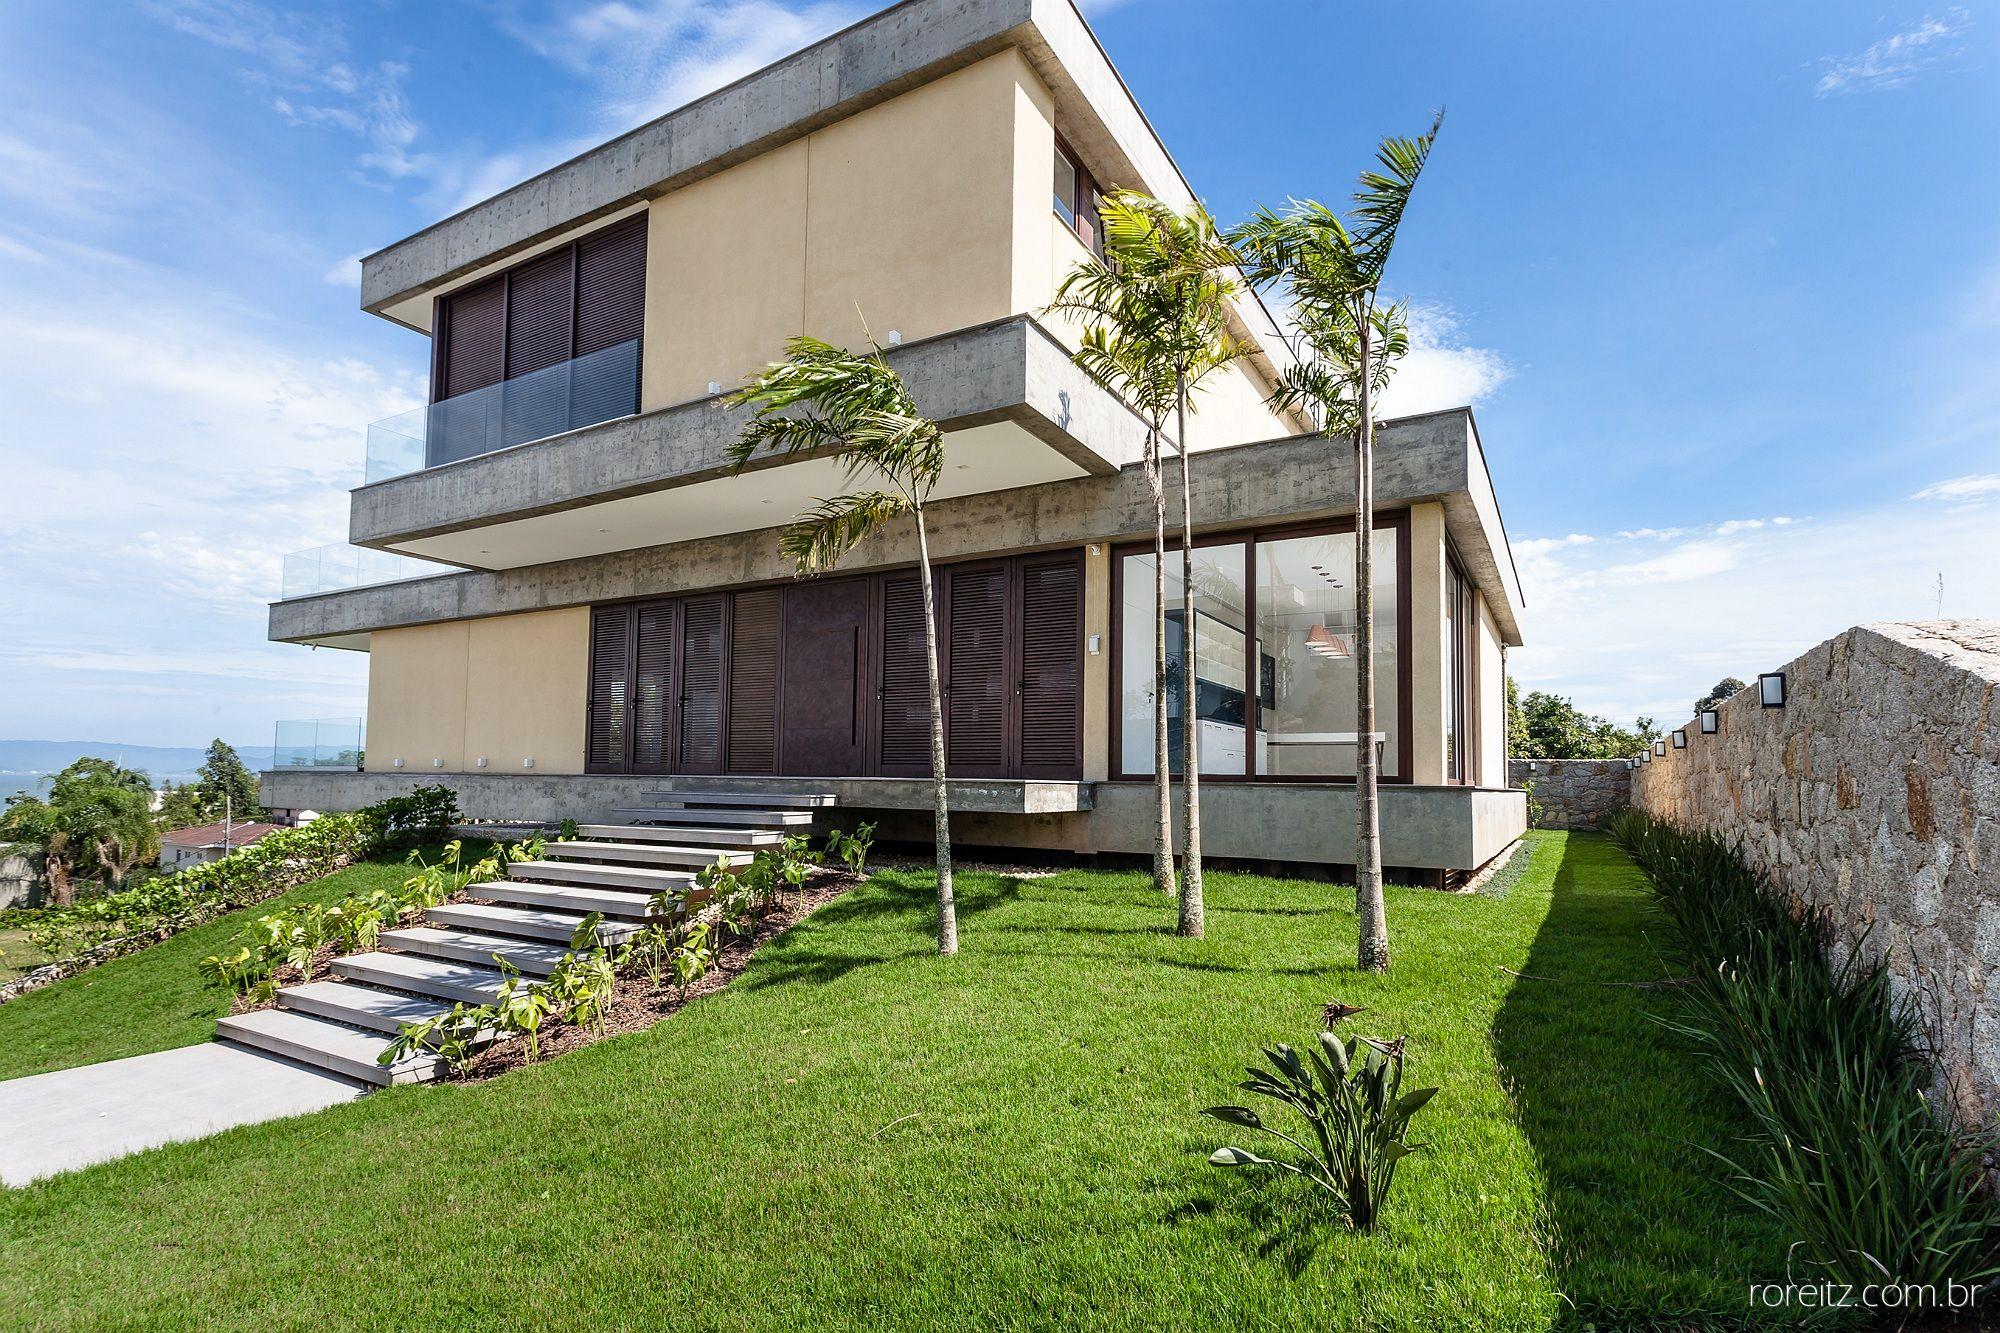 Residência RG - MarchettiBonetti+ Arquitetos Associados http://www.marchettibonetti.com.br #architecture #florianopolis